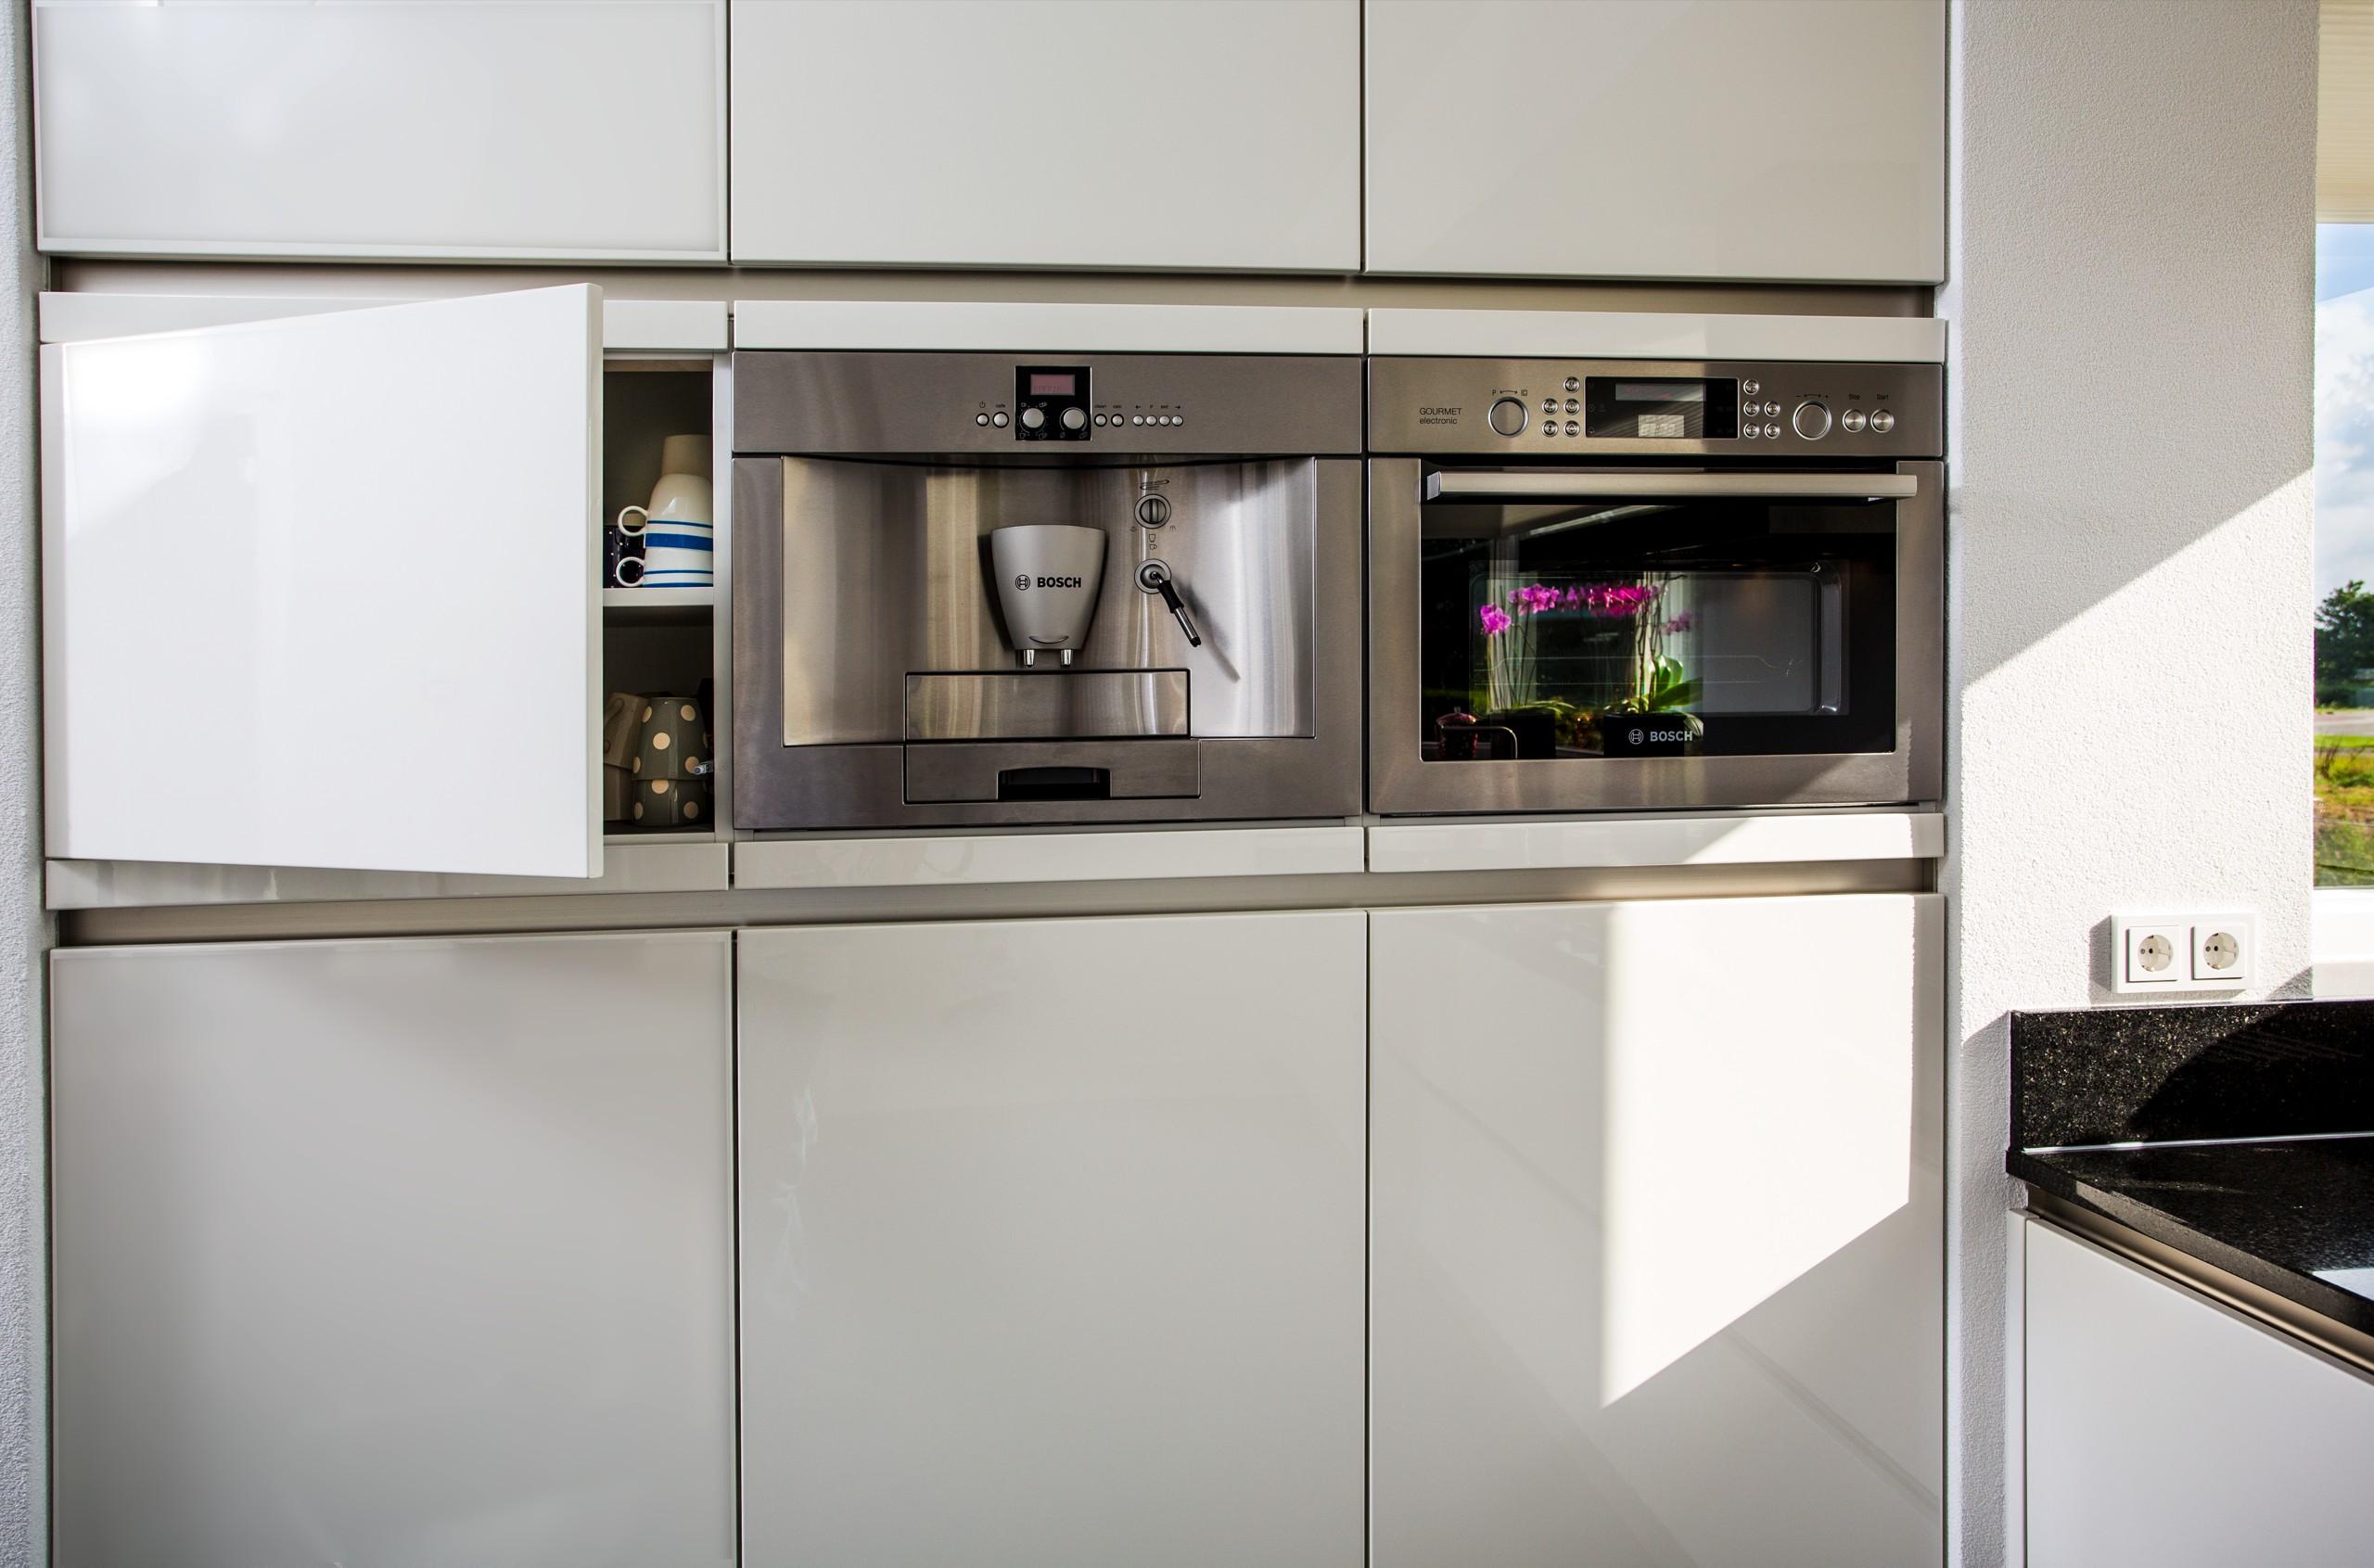 Koffiemachine De Keuken : Witte hoogglans greeploze keuken u2013 artsmedia.info